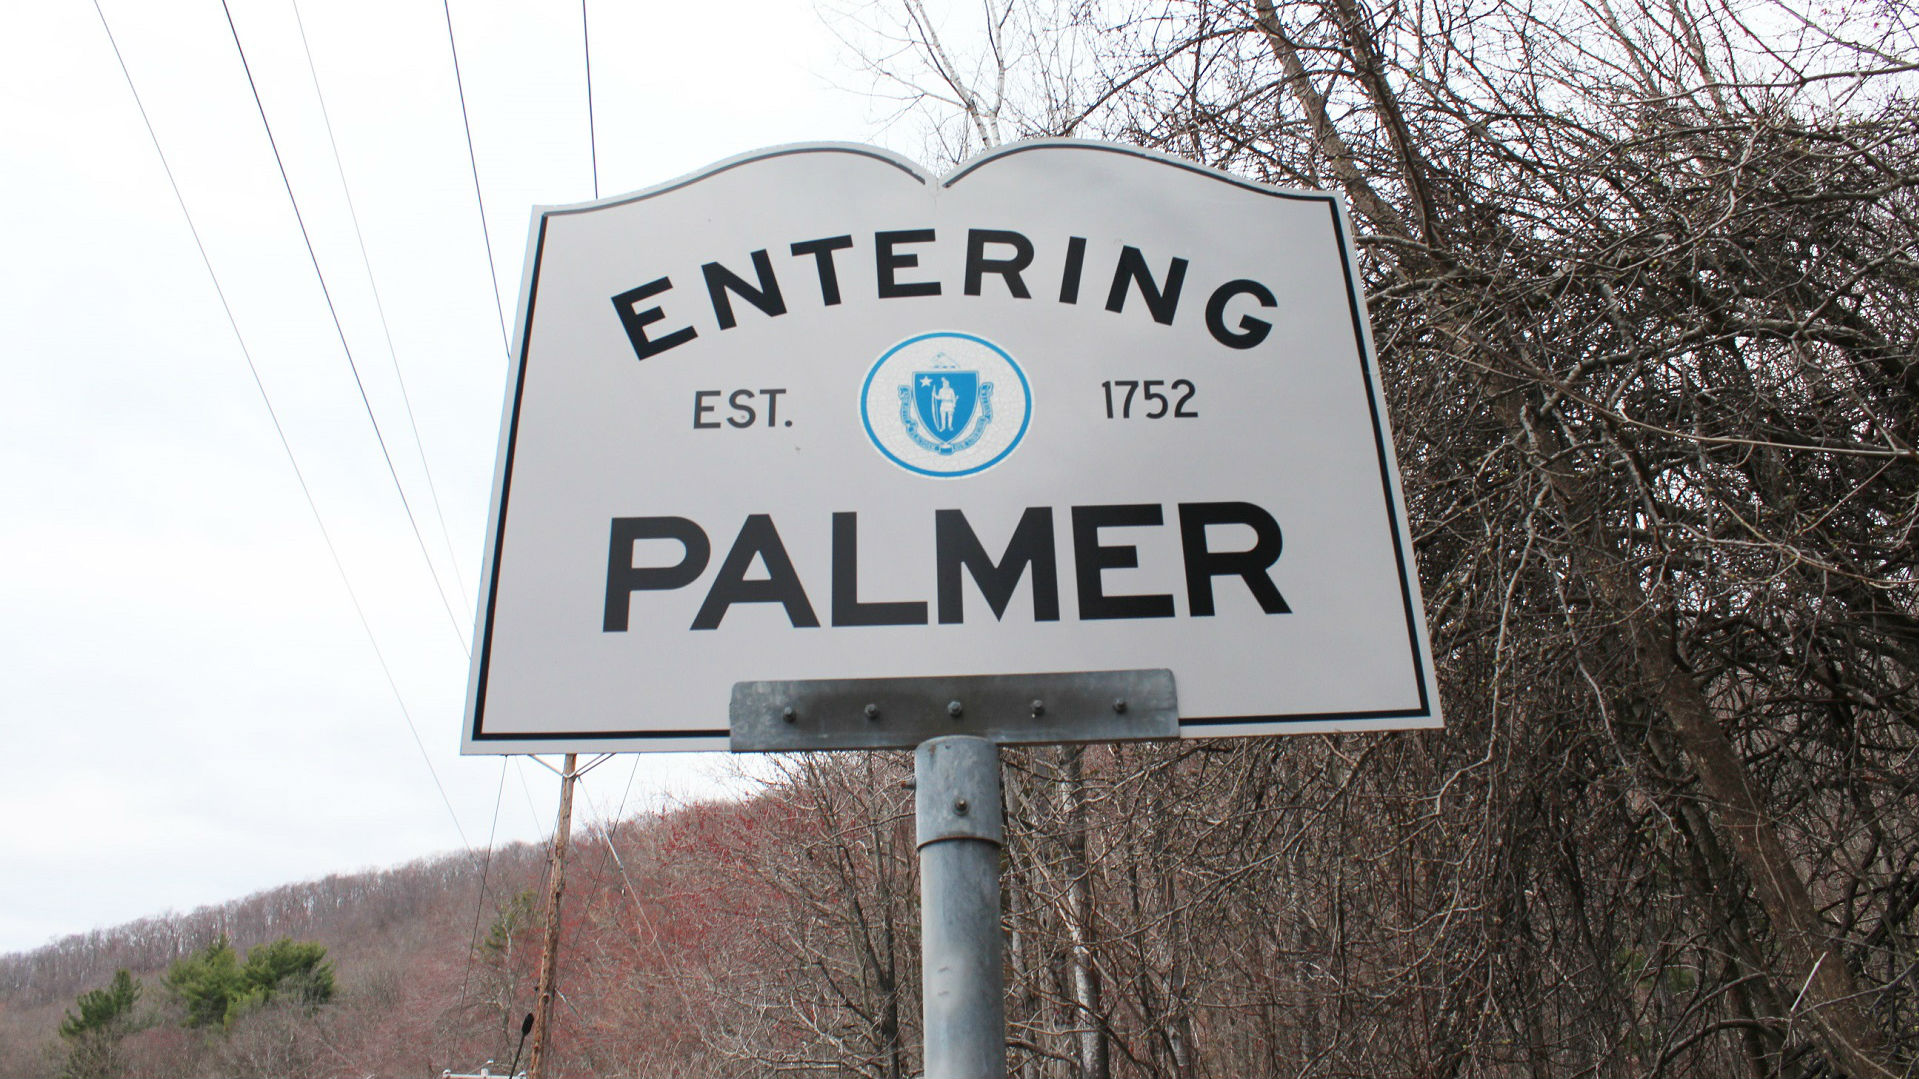 TownSigns_Palmer_1524084596144.jpg